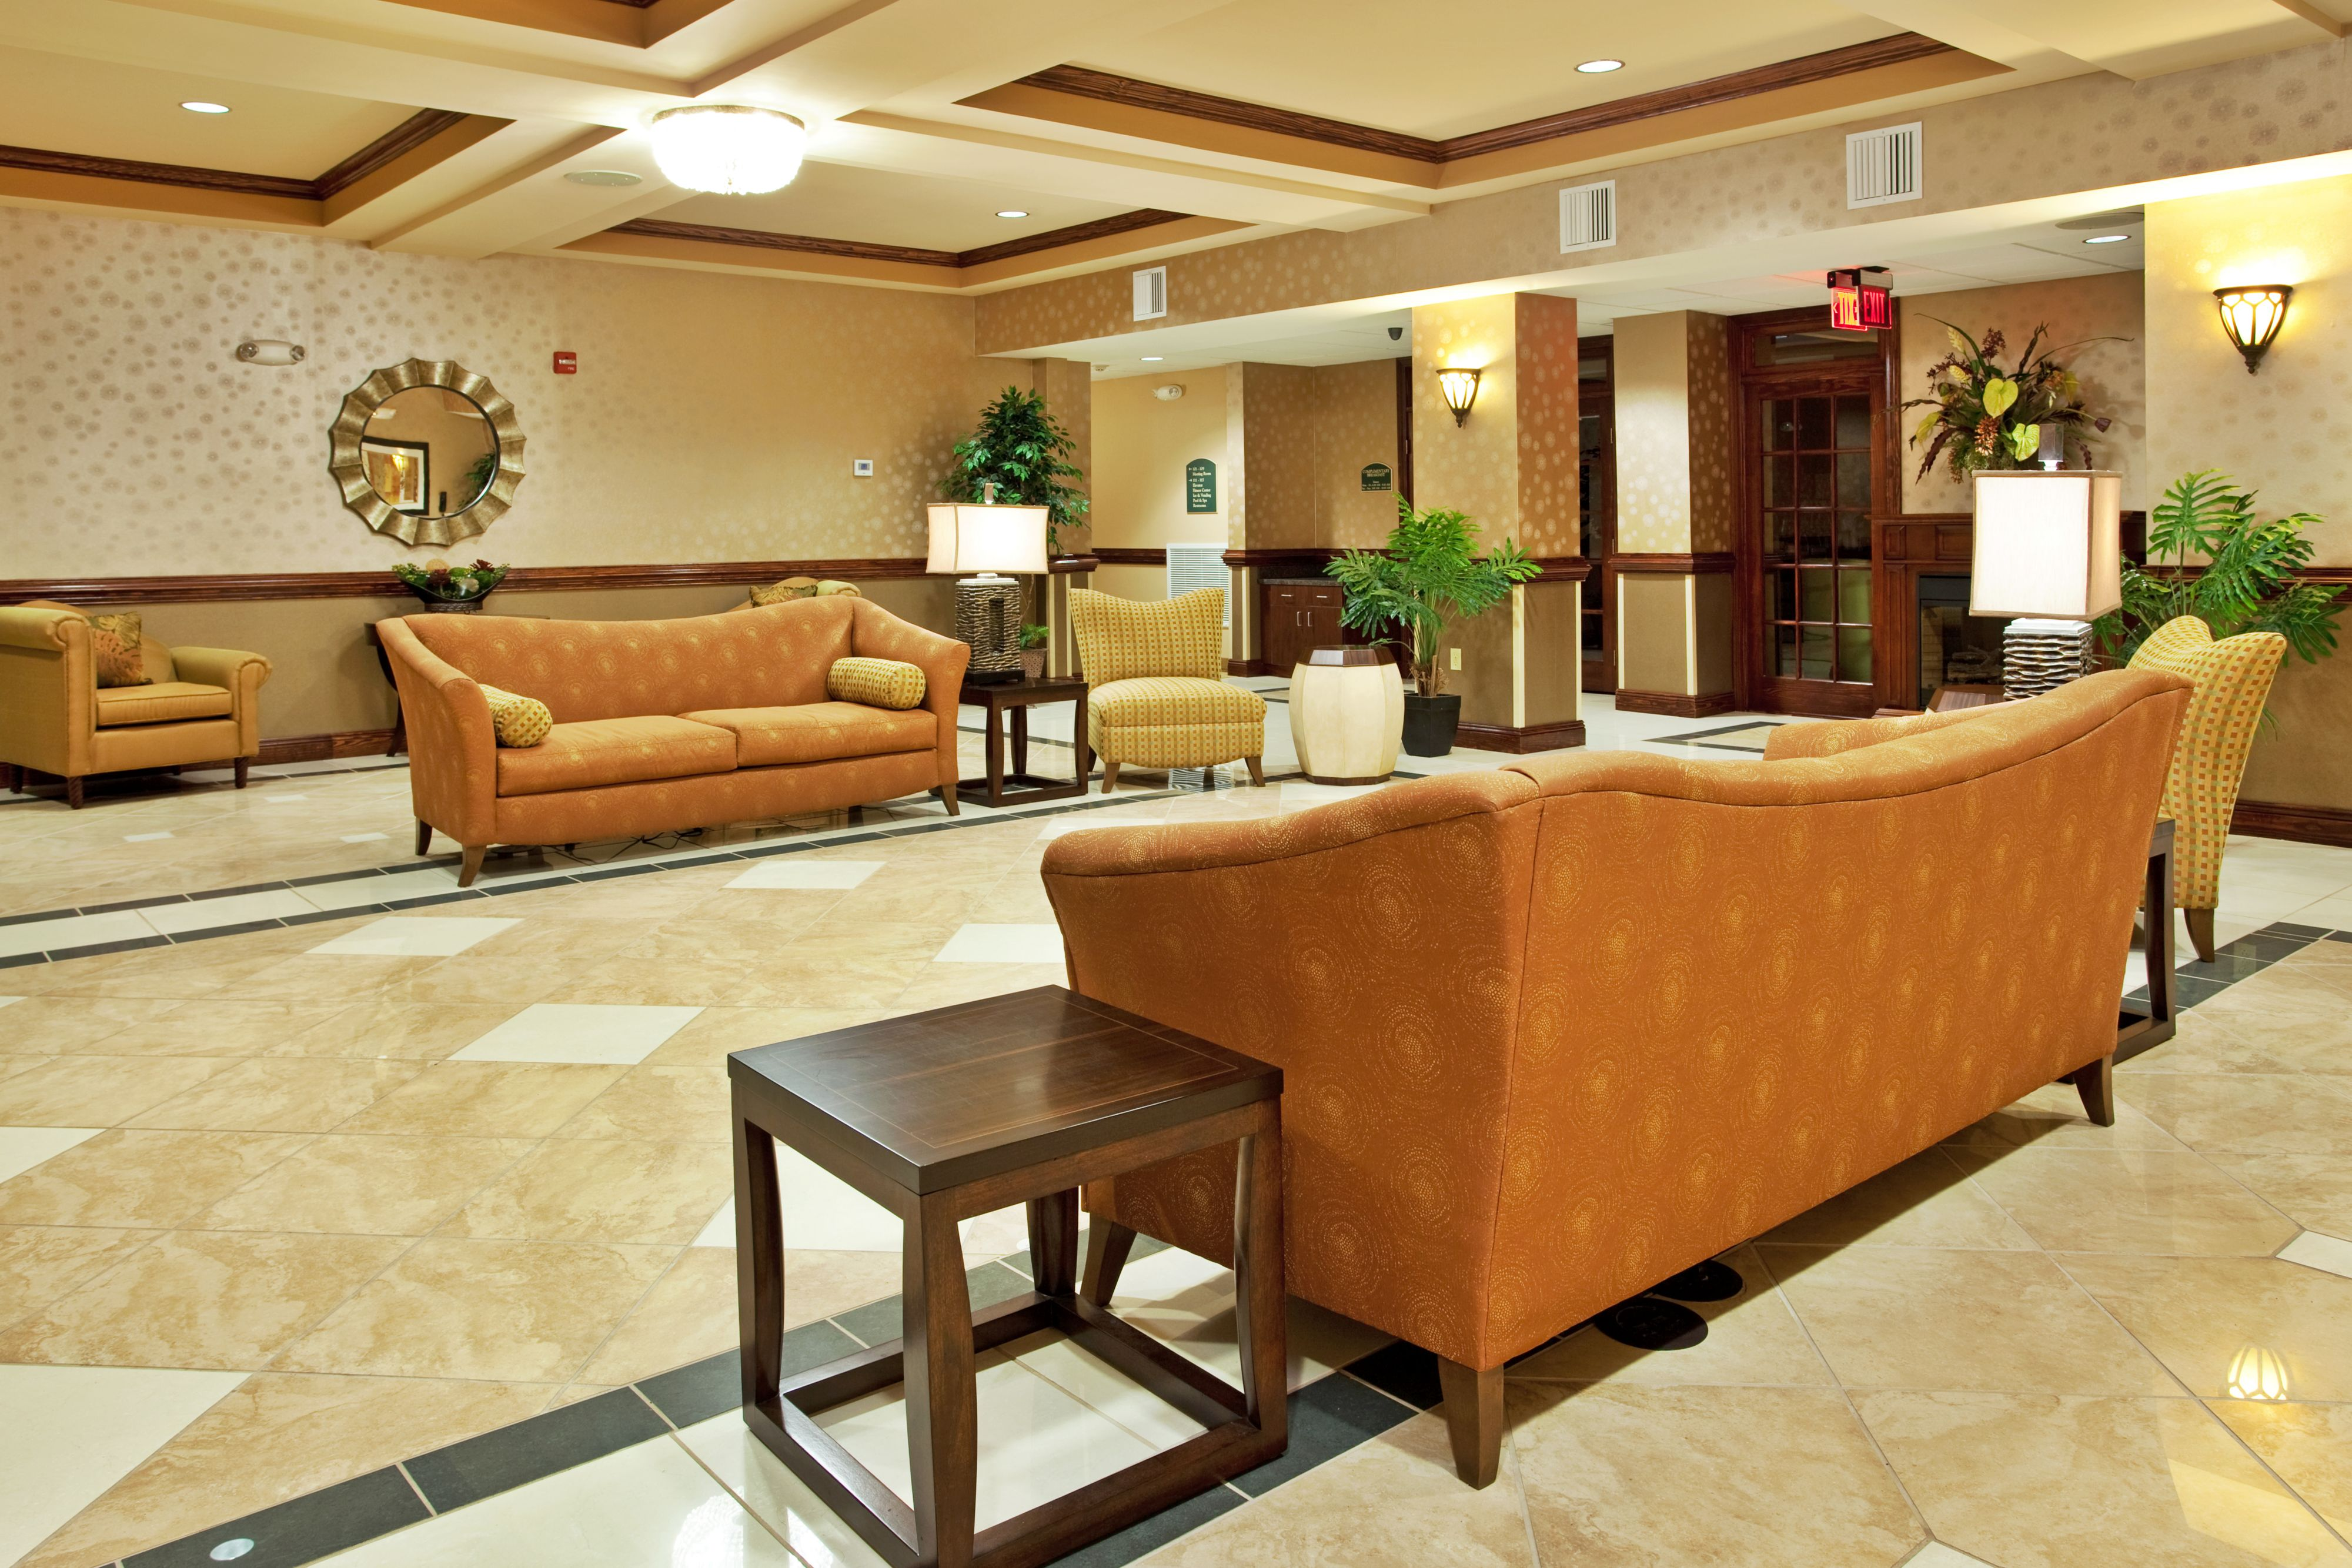 Holiday Inn Express & Suites Biloxi- Ocean Springs image 4